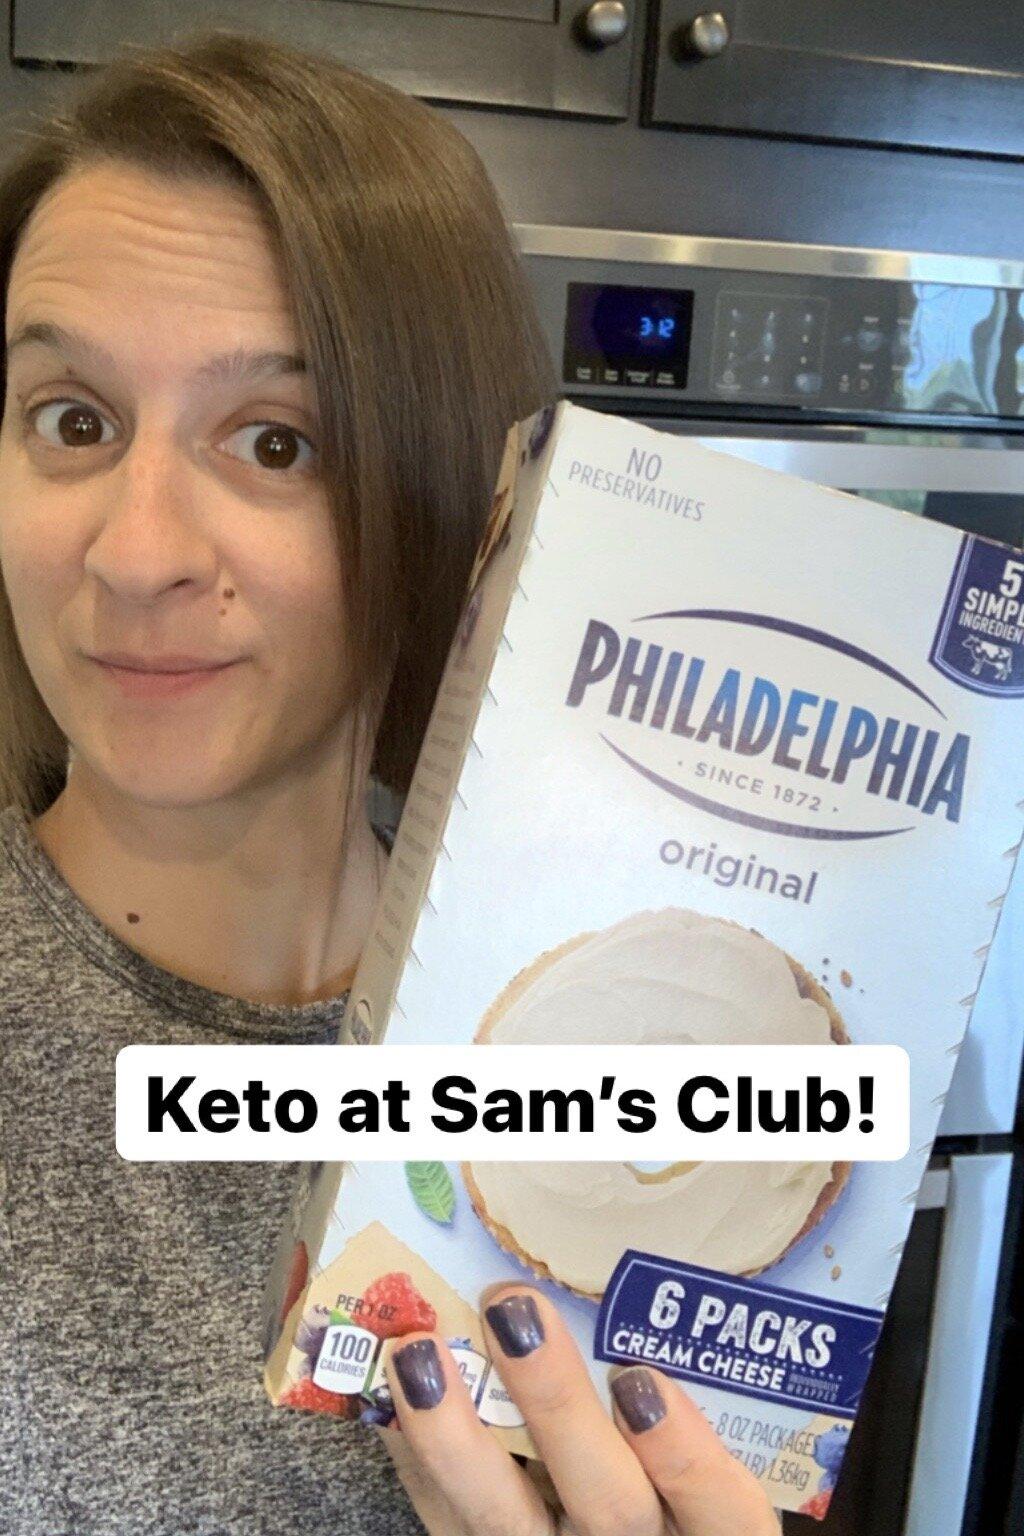 The Keto Dad Sam's Club grocery shopping list Bacon